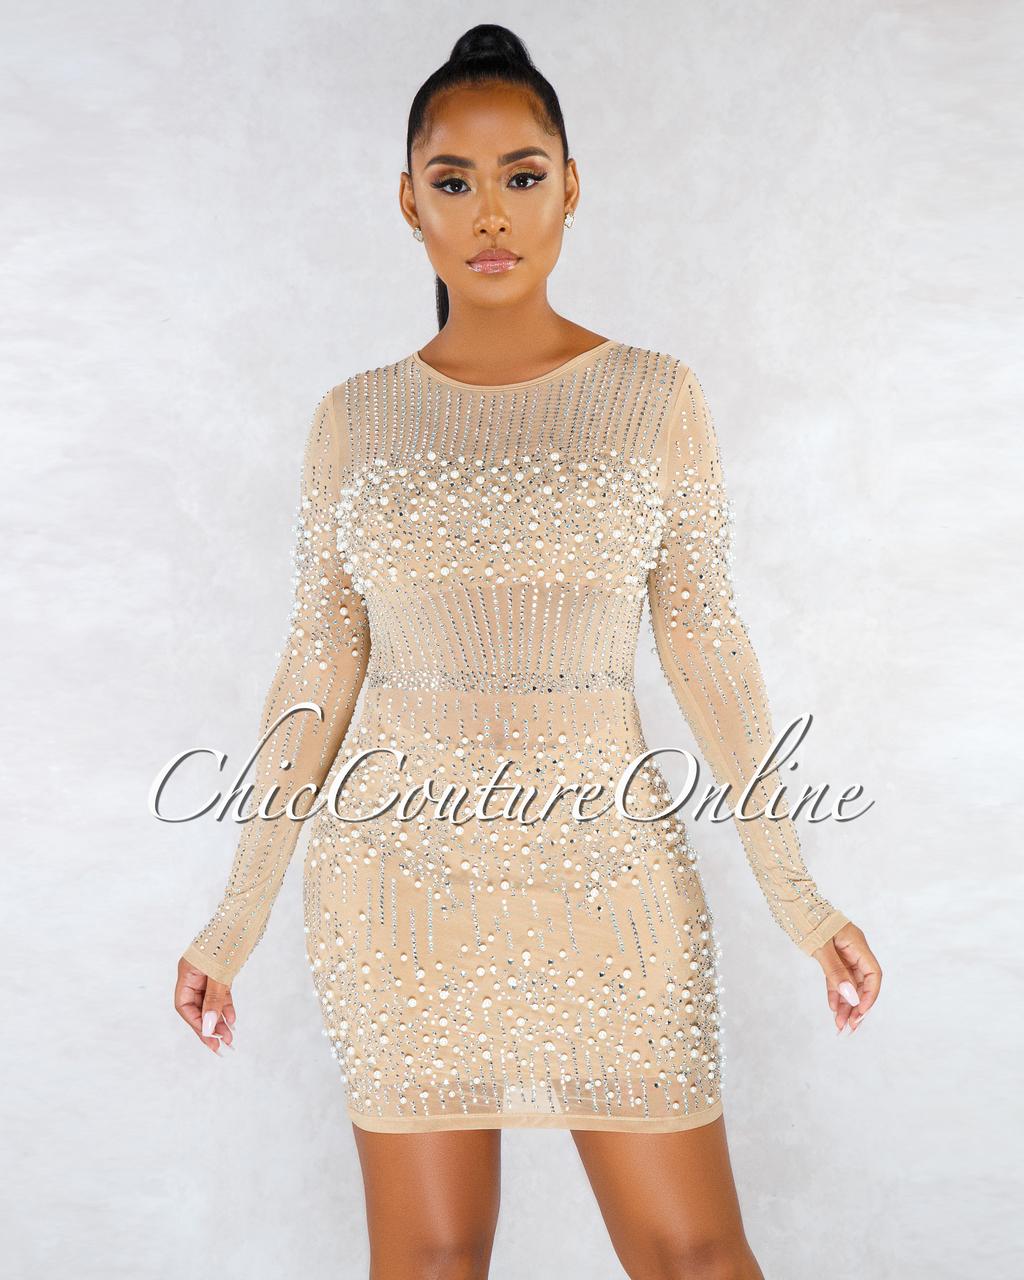 Catrin Nude Pearl Rhinestones Mesh Mini Dress